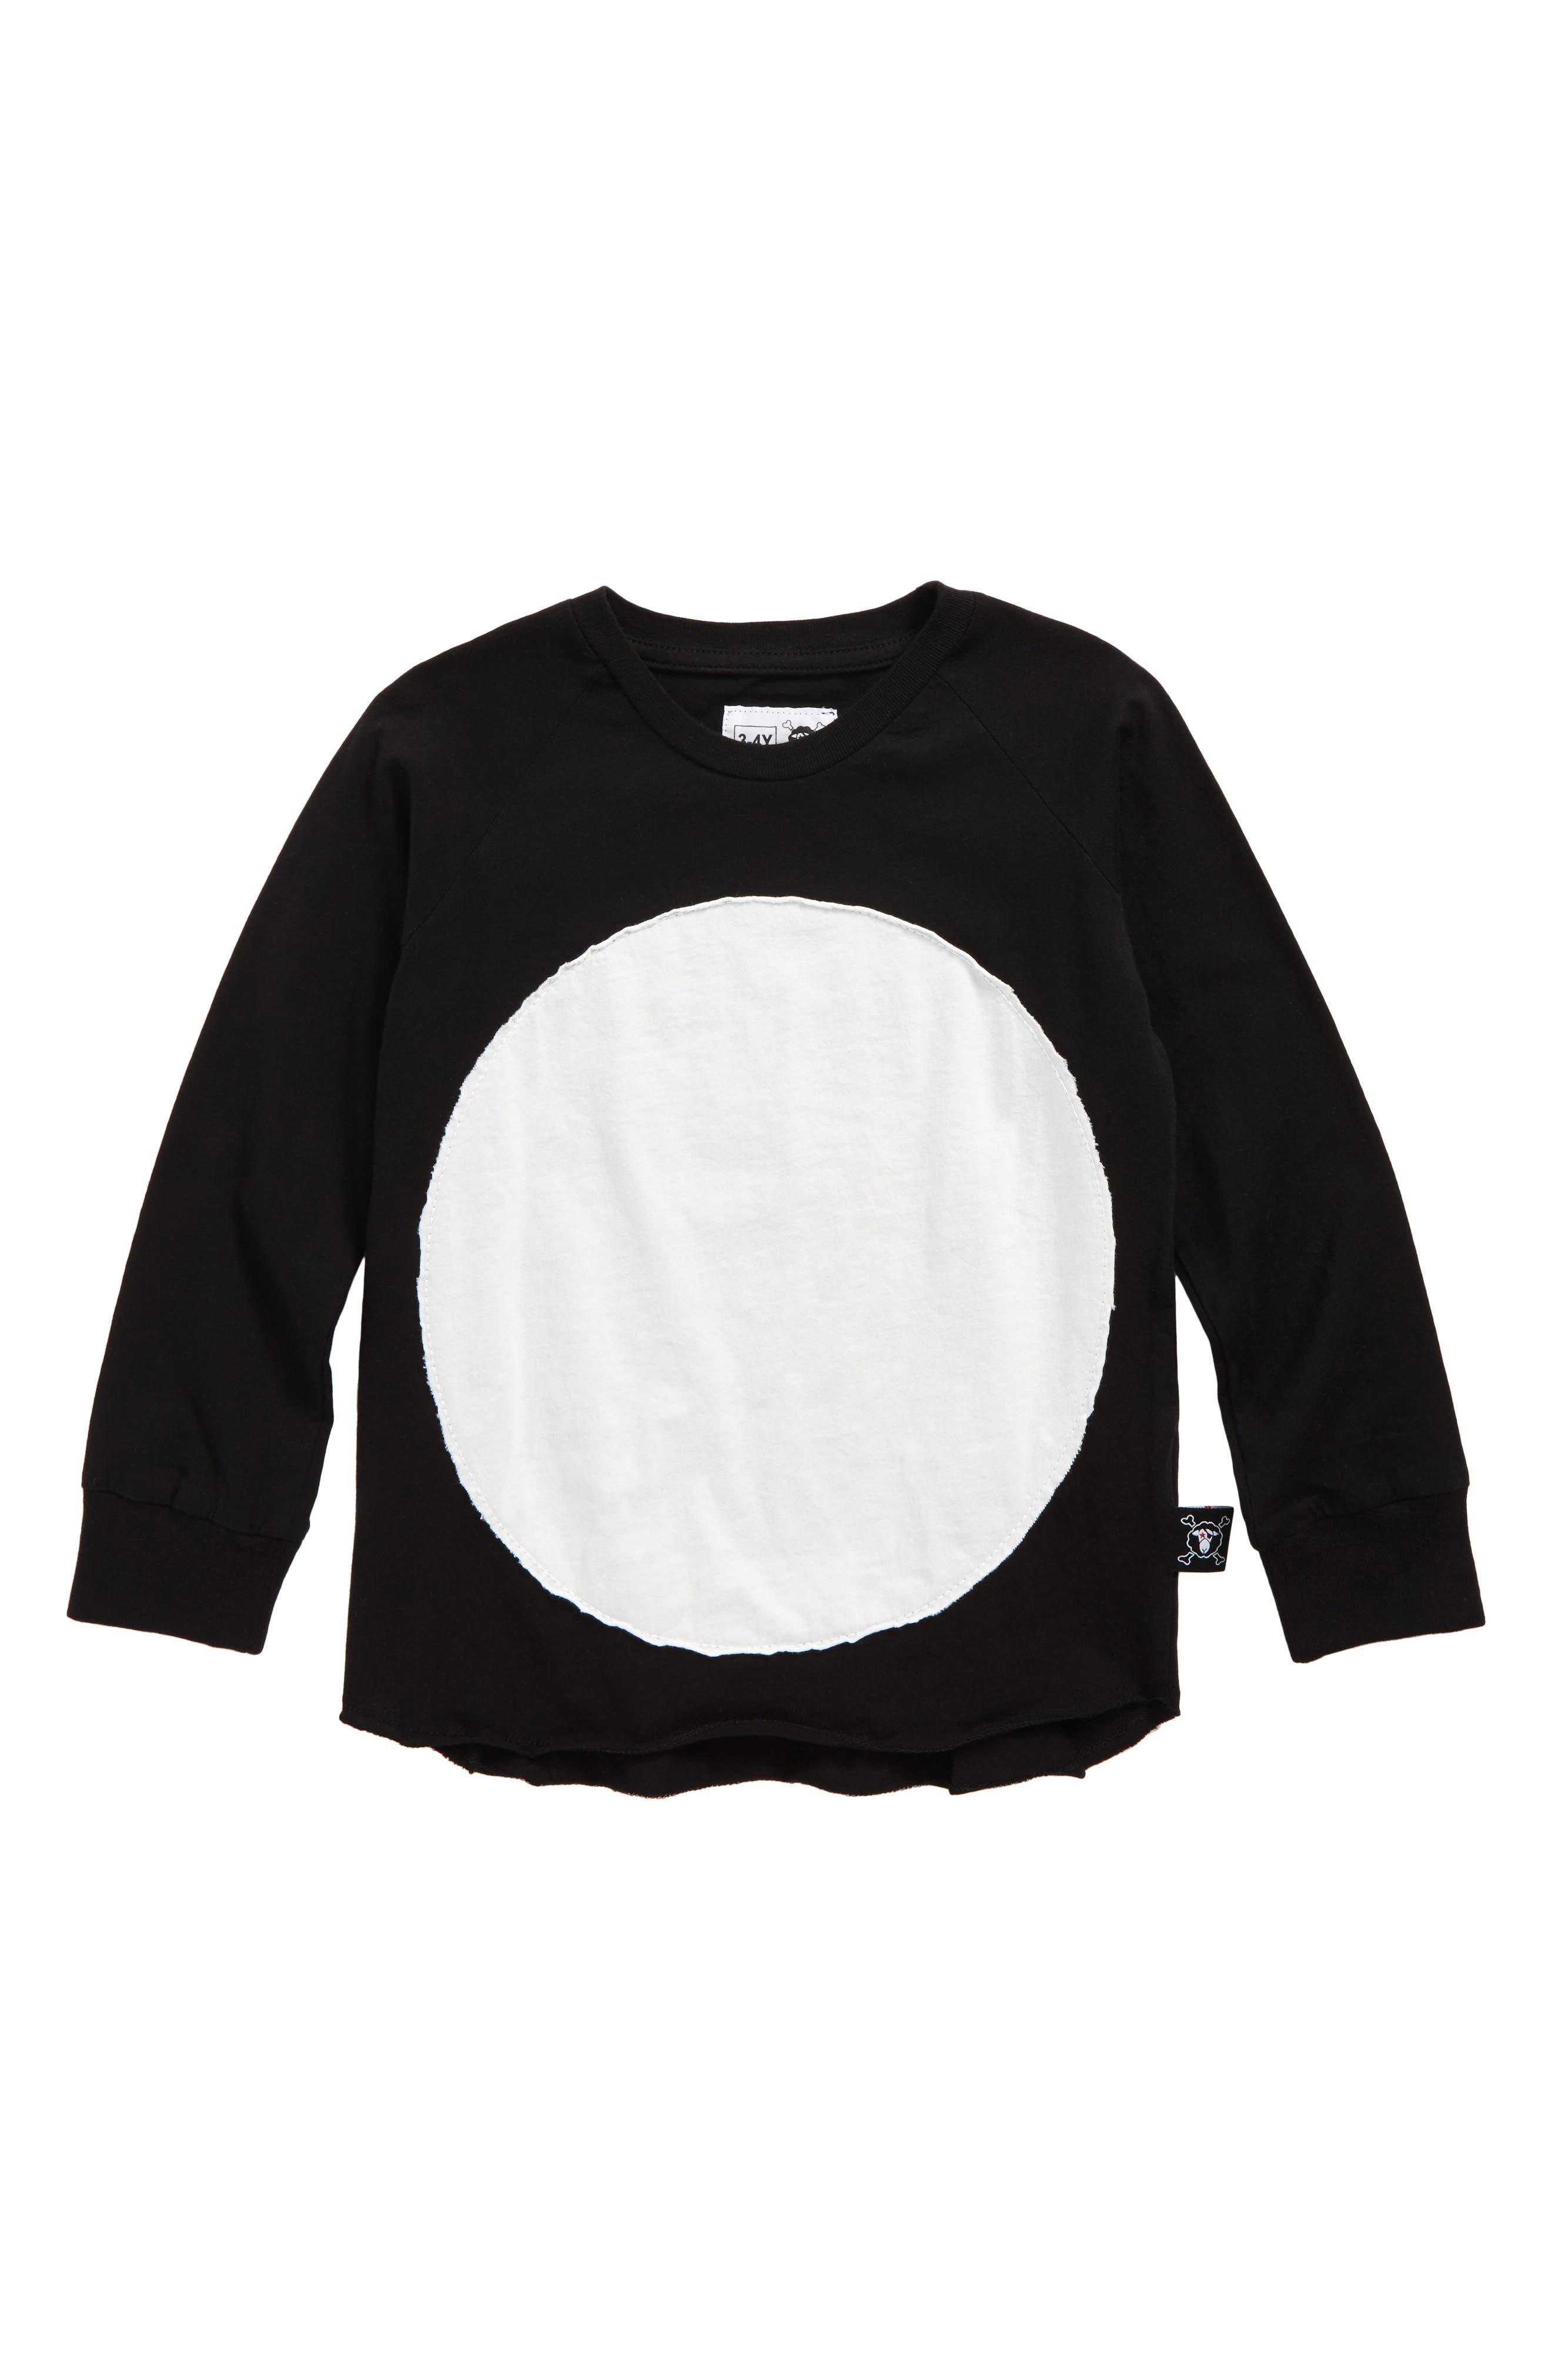 Alternate Image 1 Selected - NUNUNU Circle Patch T-Shirt (Toddler Boys, Little Boys & Big Boys)